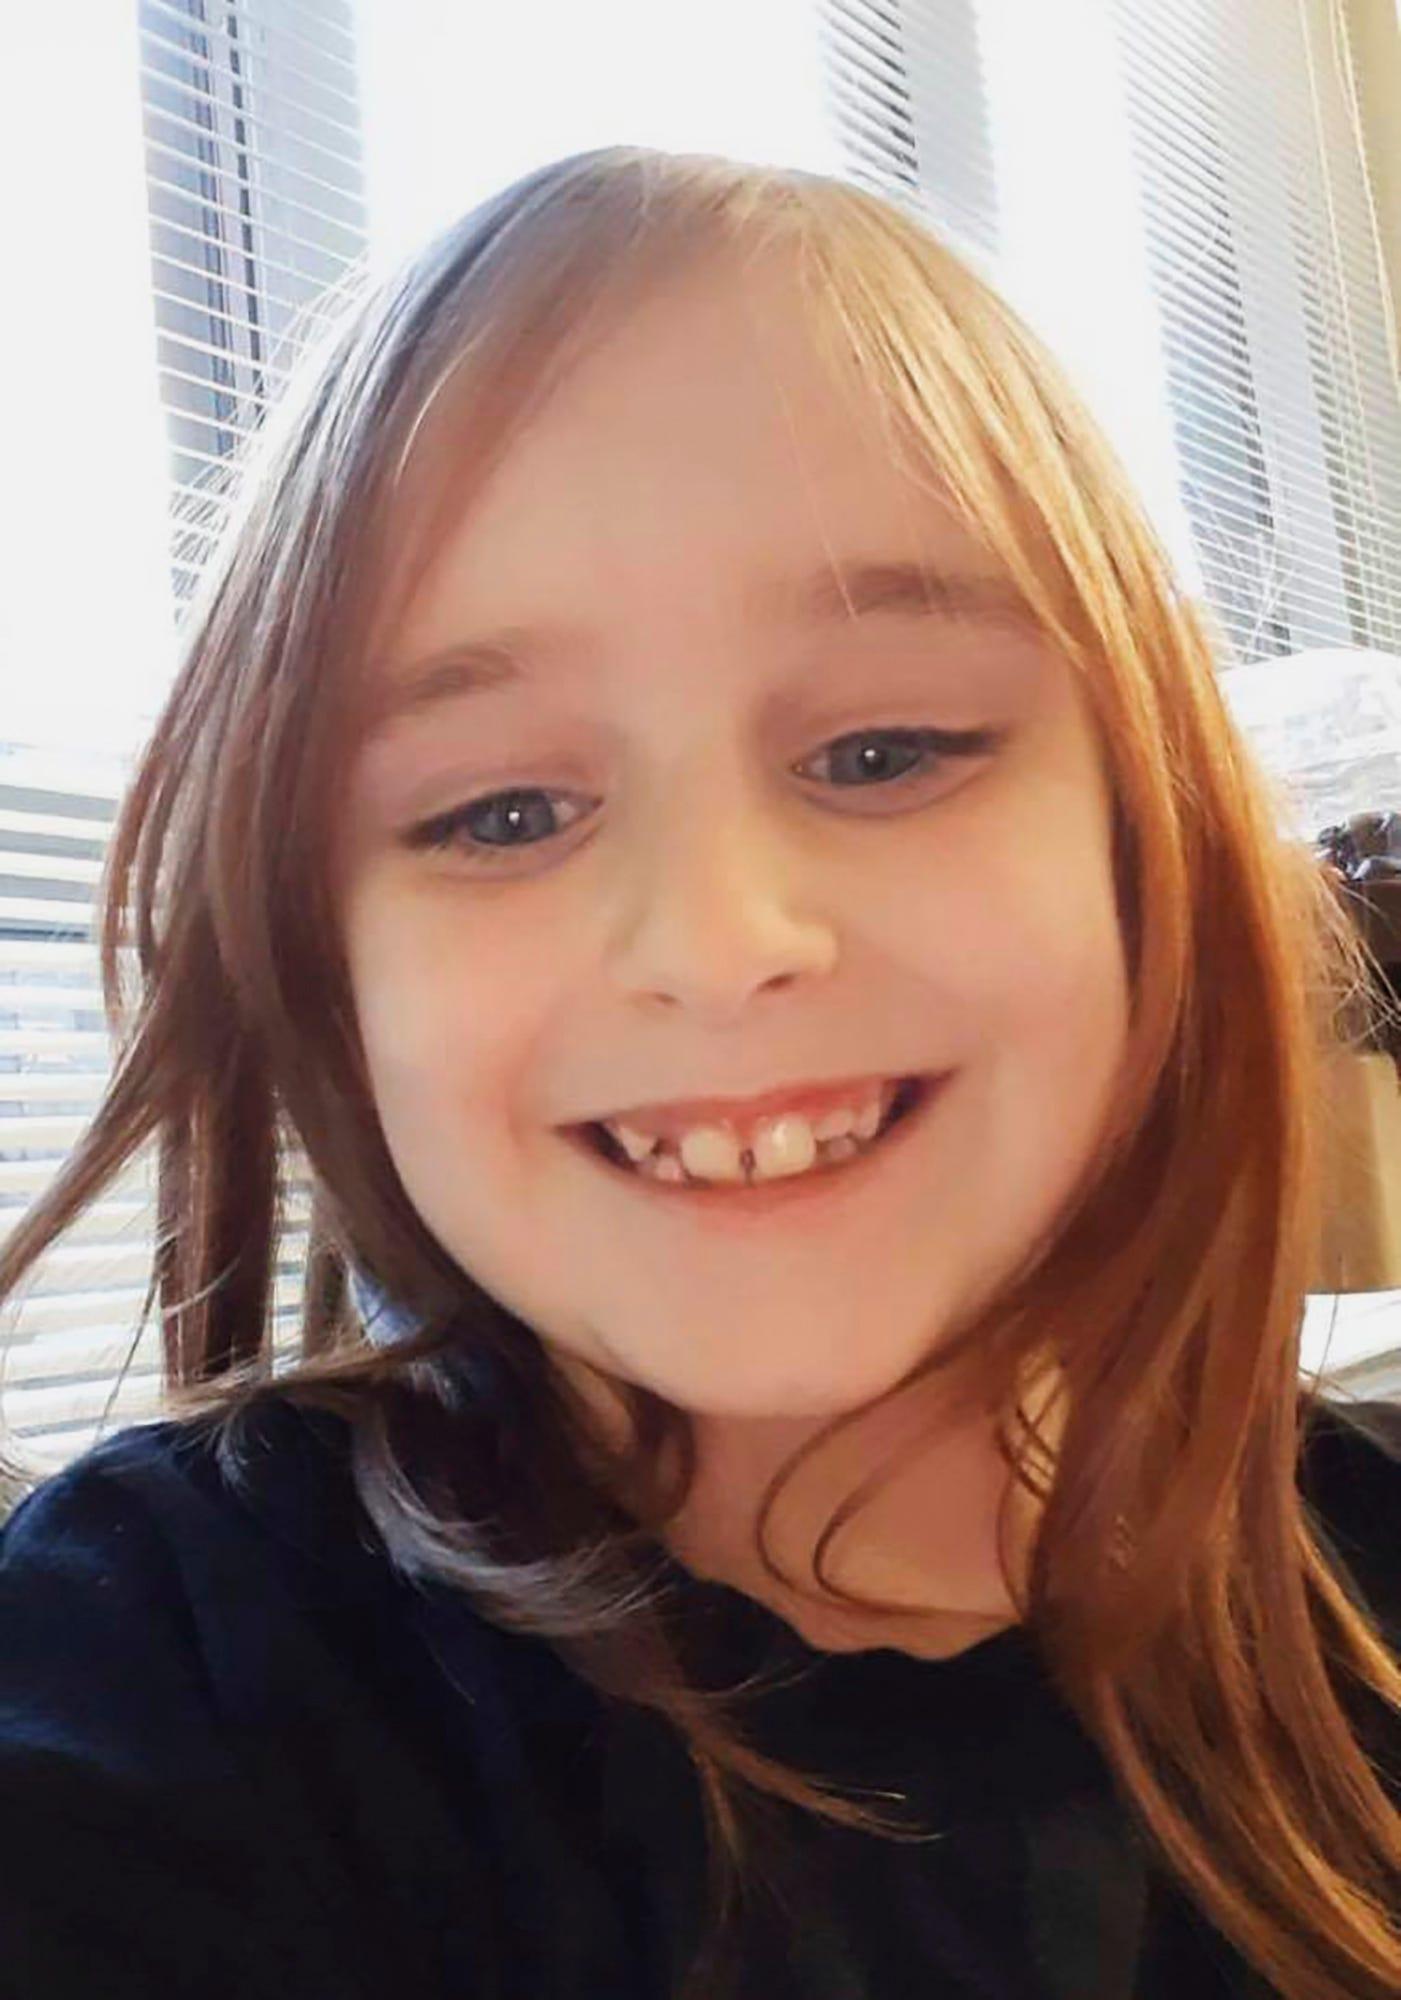 Autopsy: South Carolina girl Faye Marie Swetlik died of homicide by asphyxiation